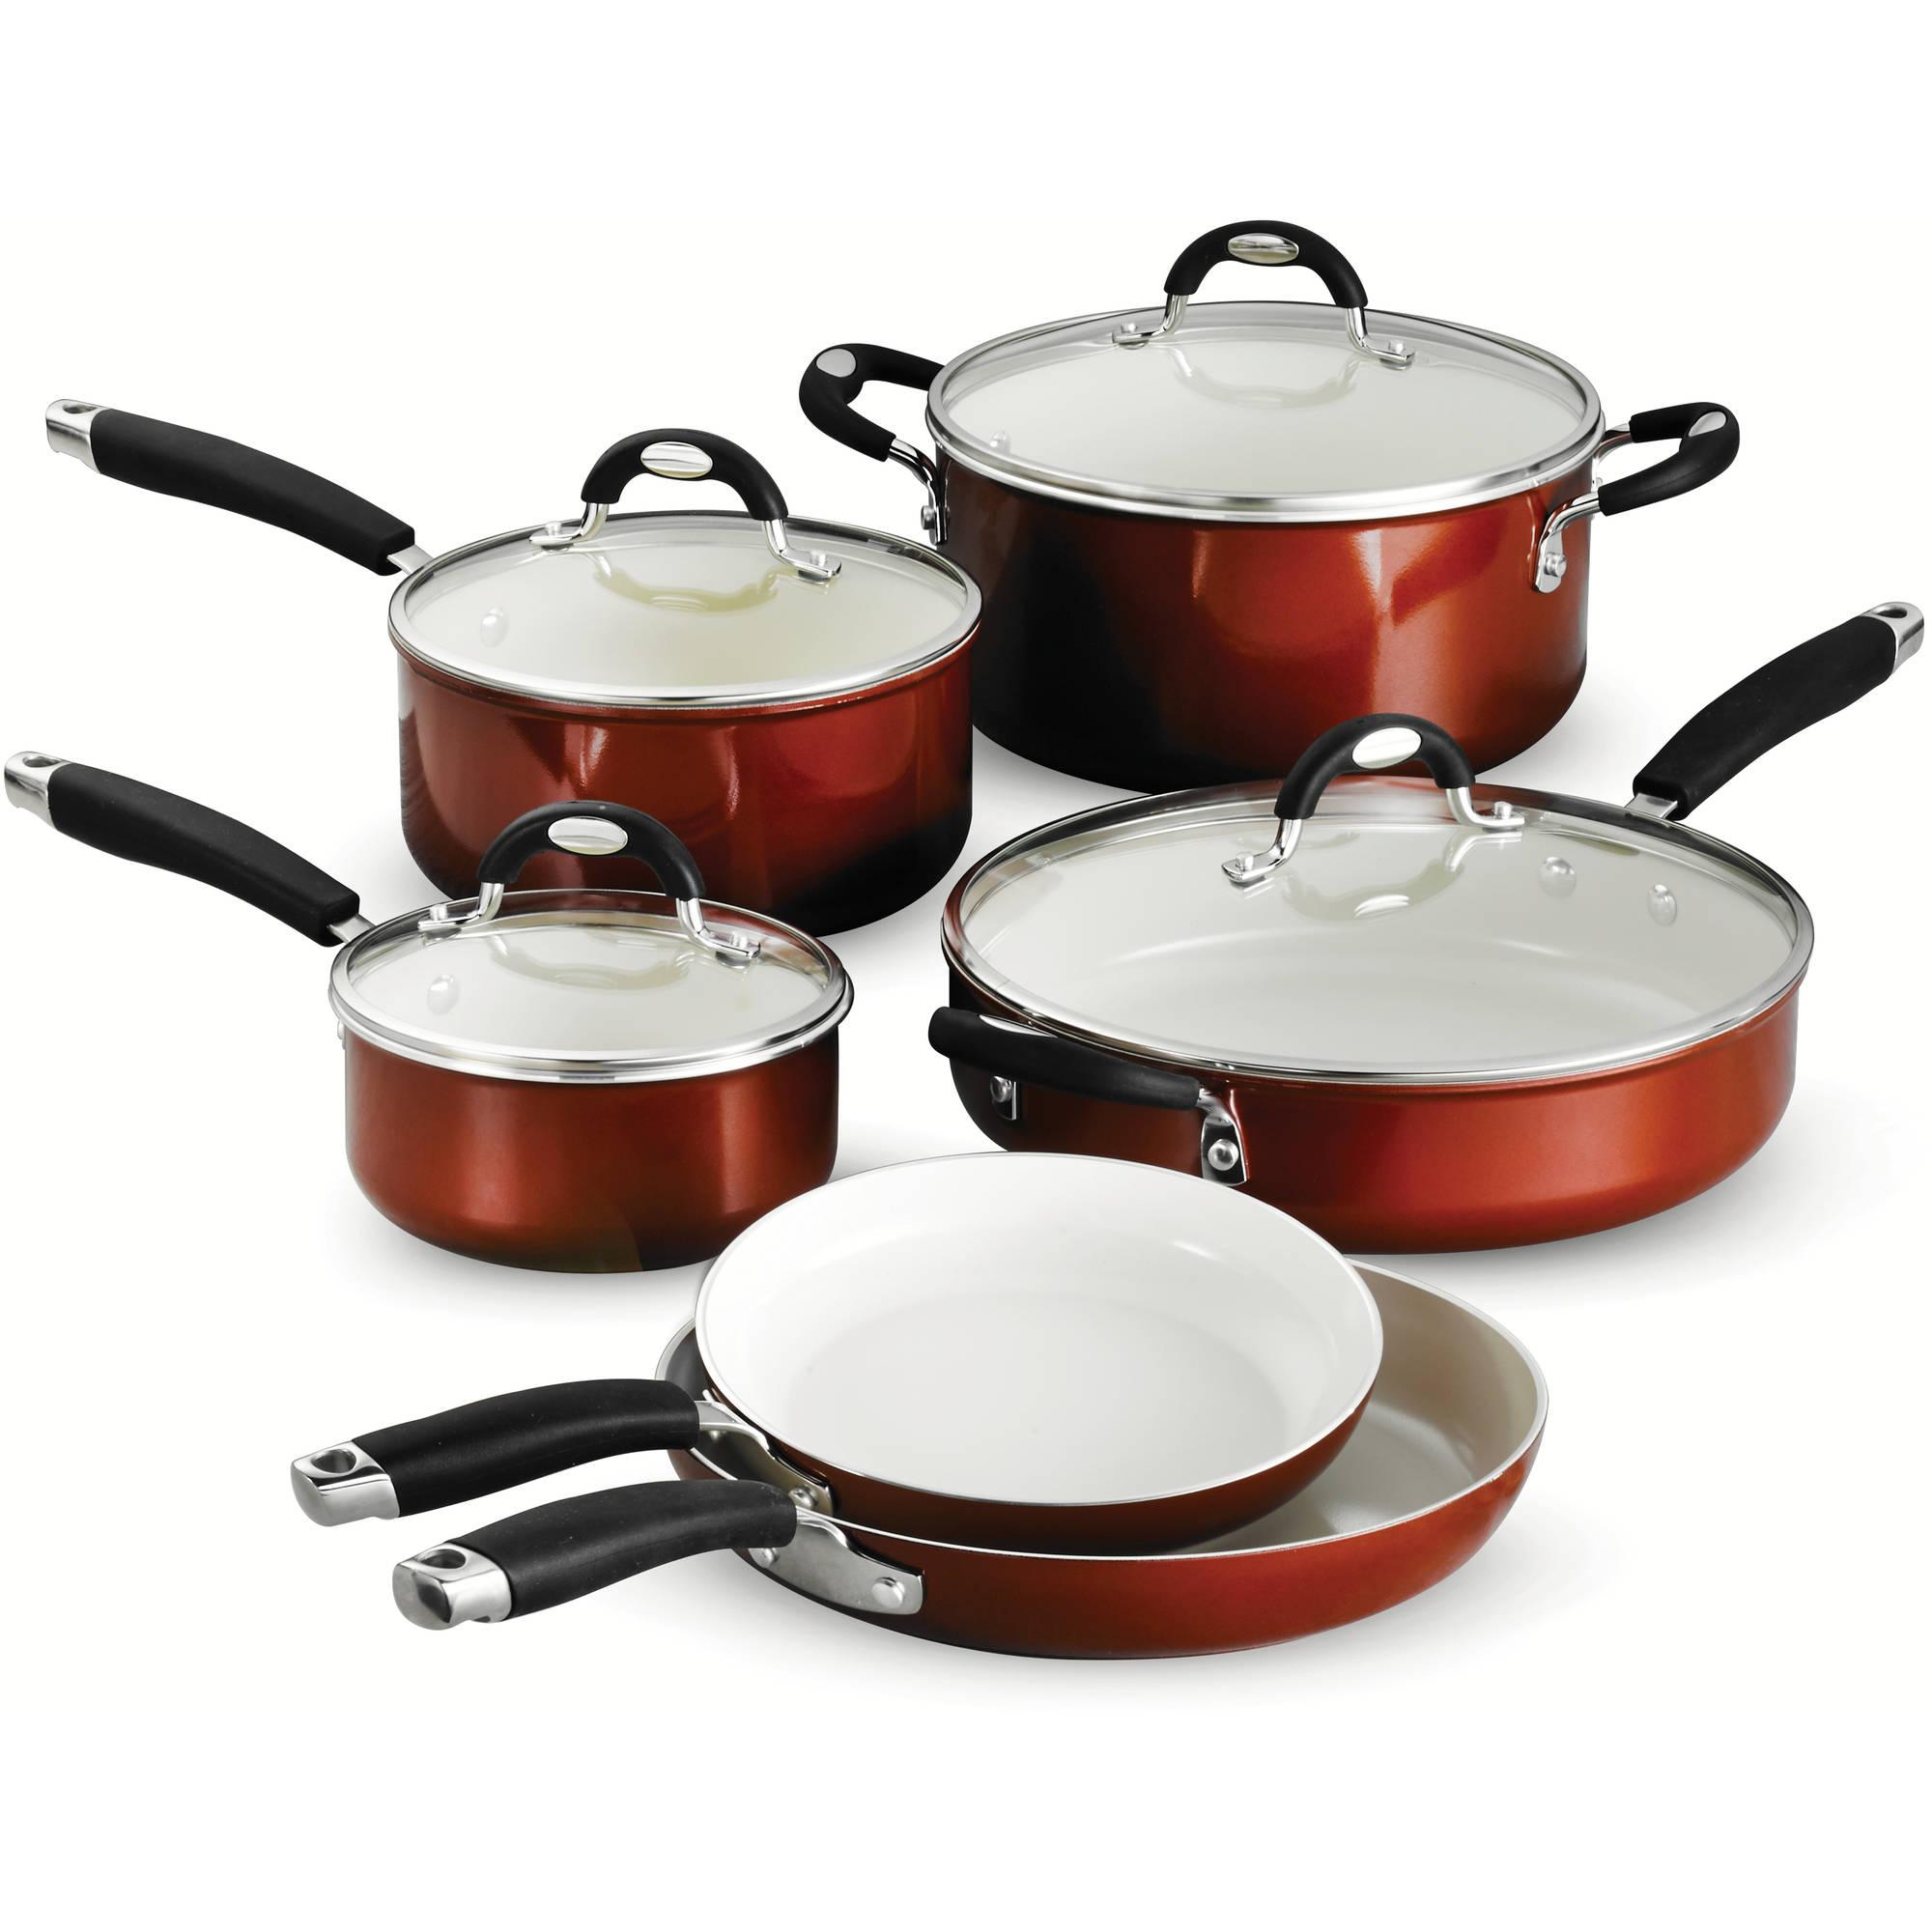 Tramontina Style 10-Piece Cookware Set, Metallic Copper